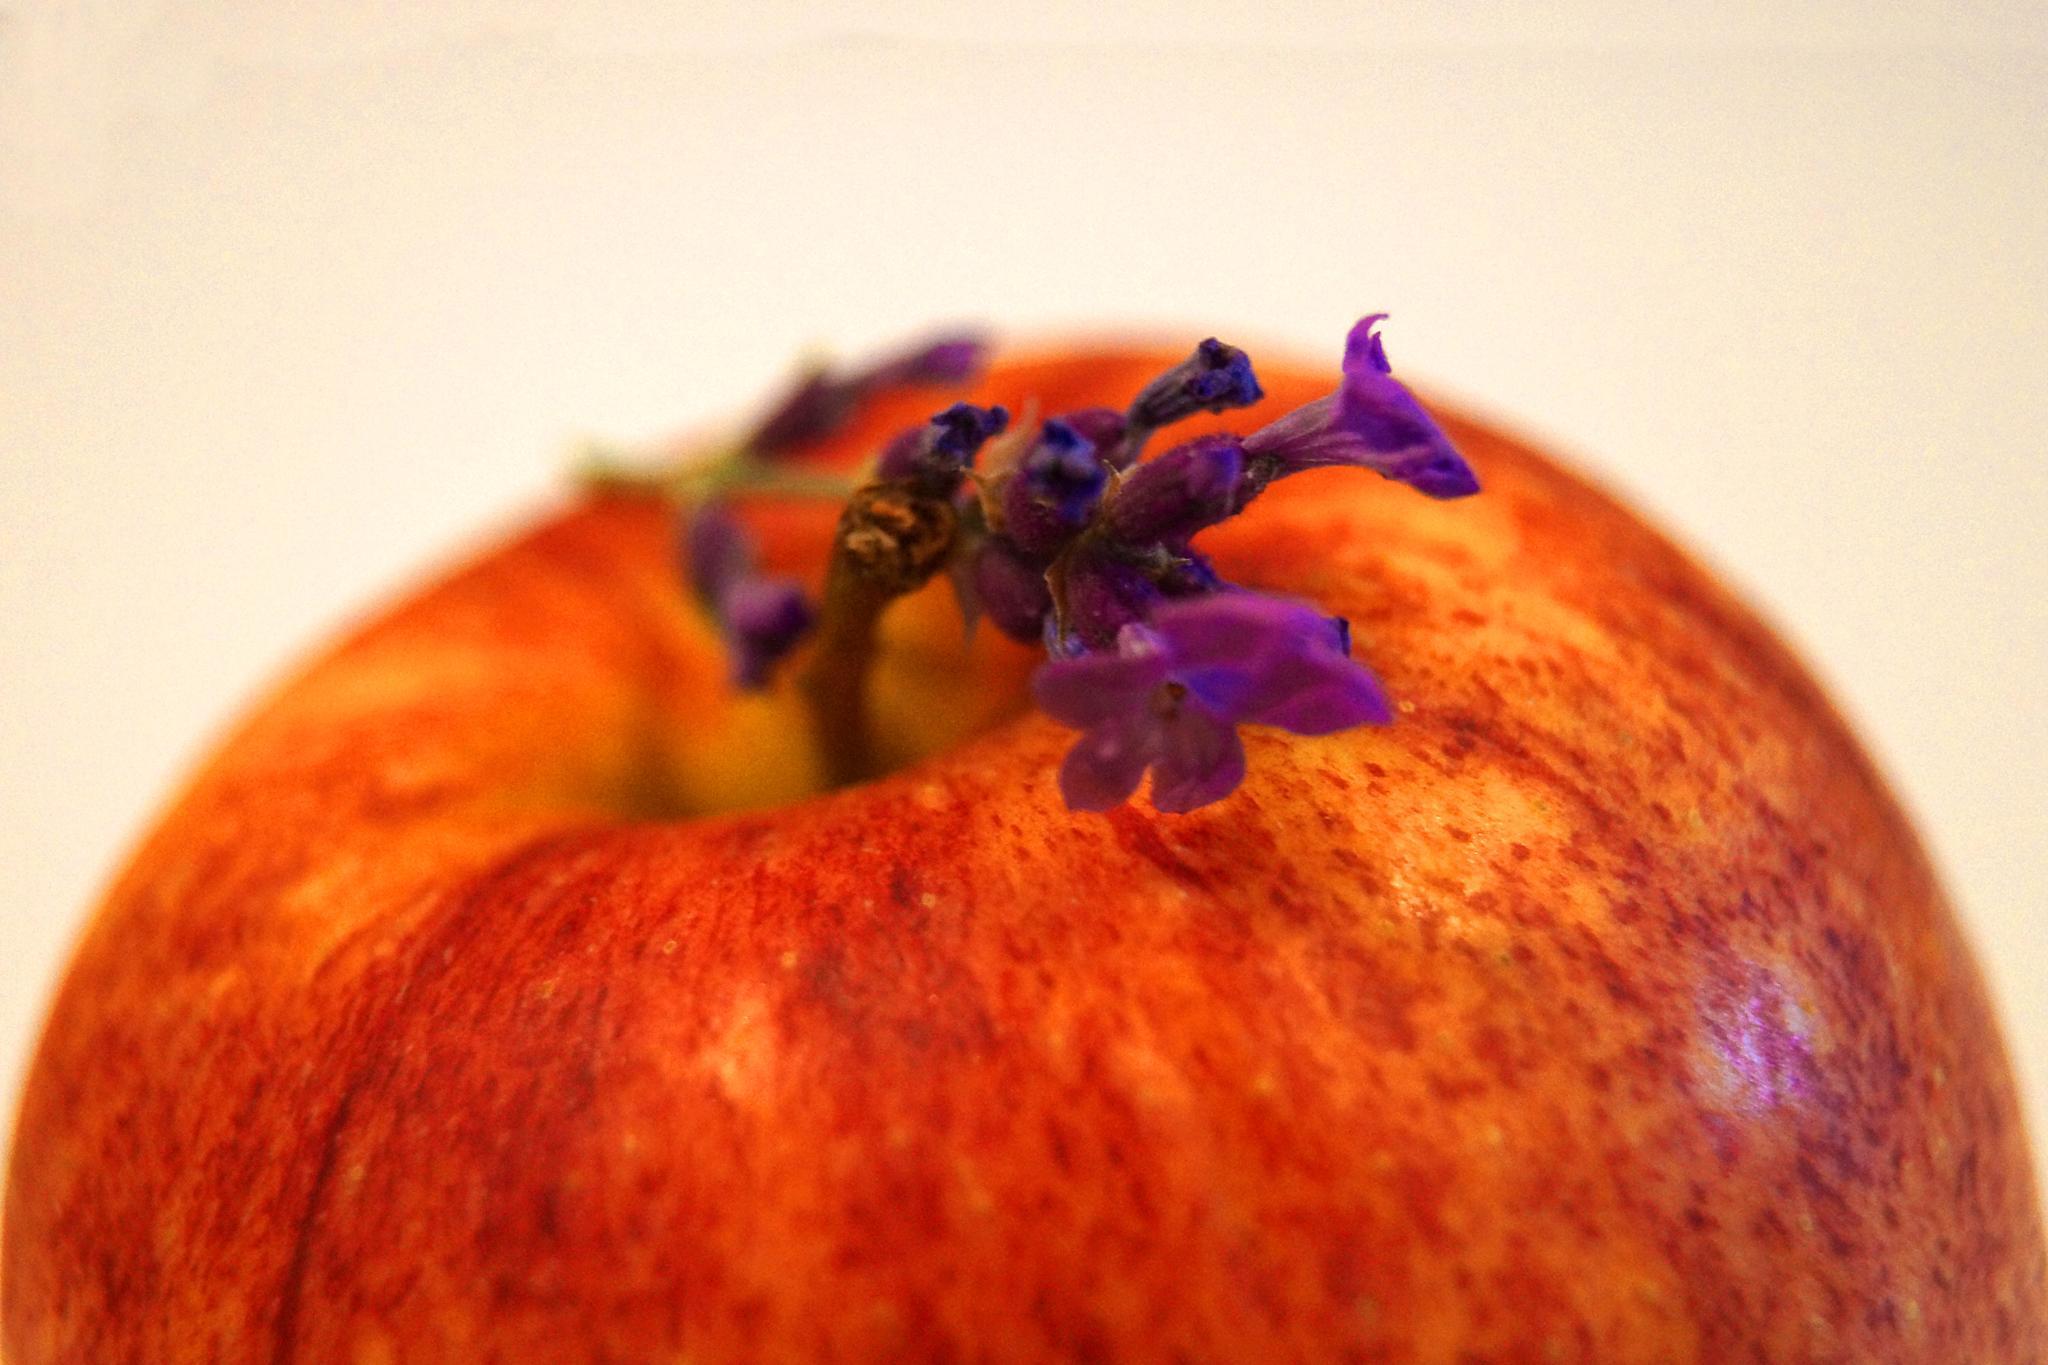 an apple by sreten nakićenović